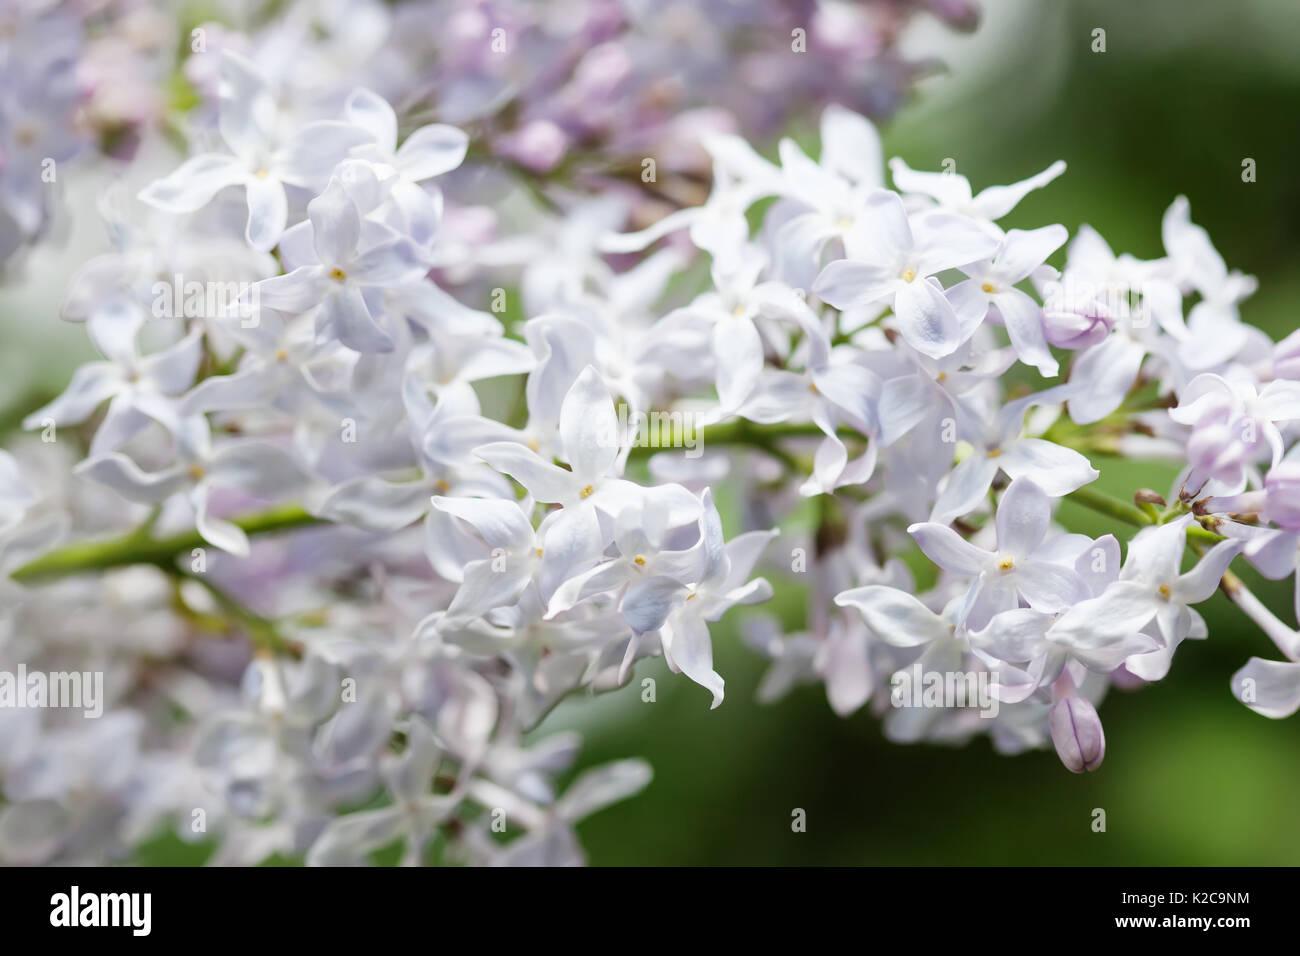 Blooming White Lilac Bush Flower Petals Macro View Soft Focus